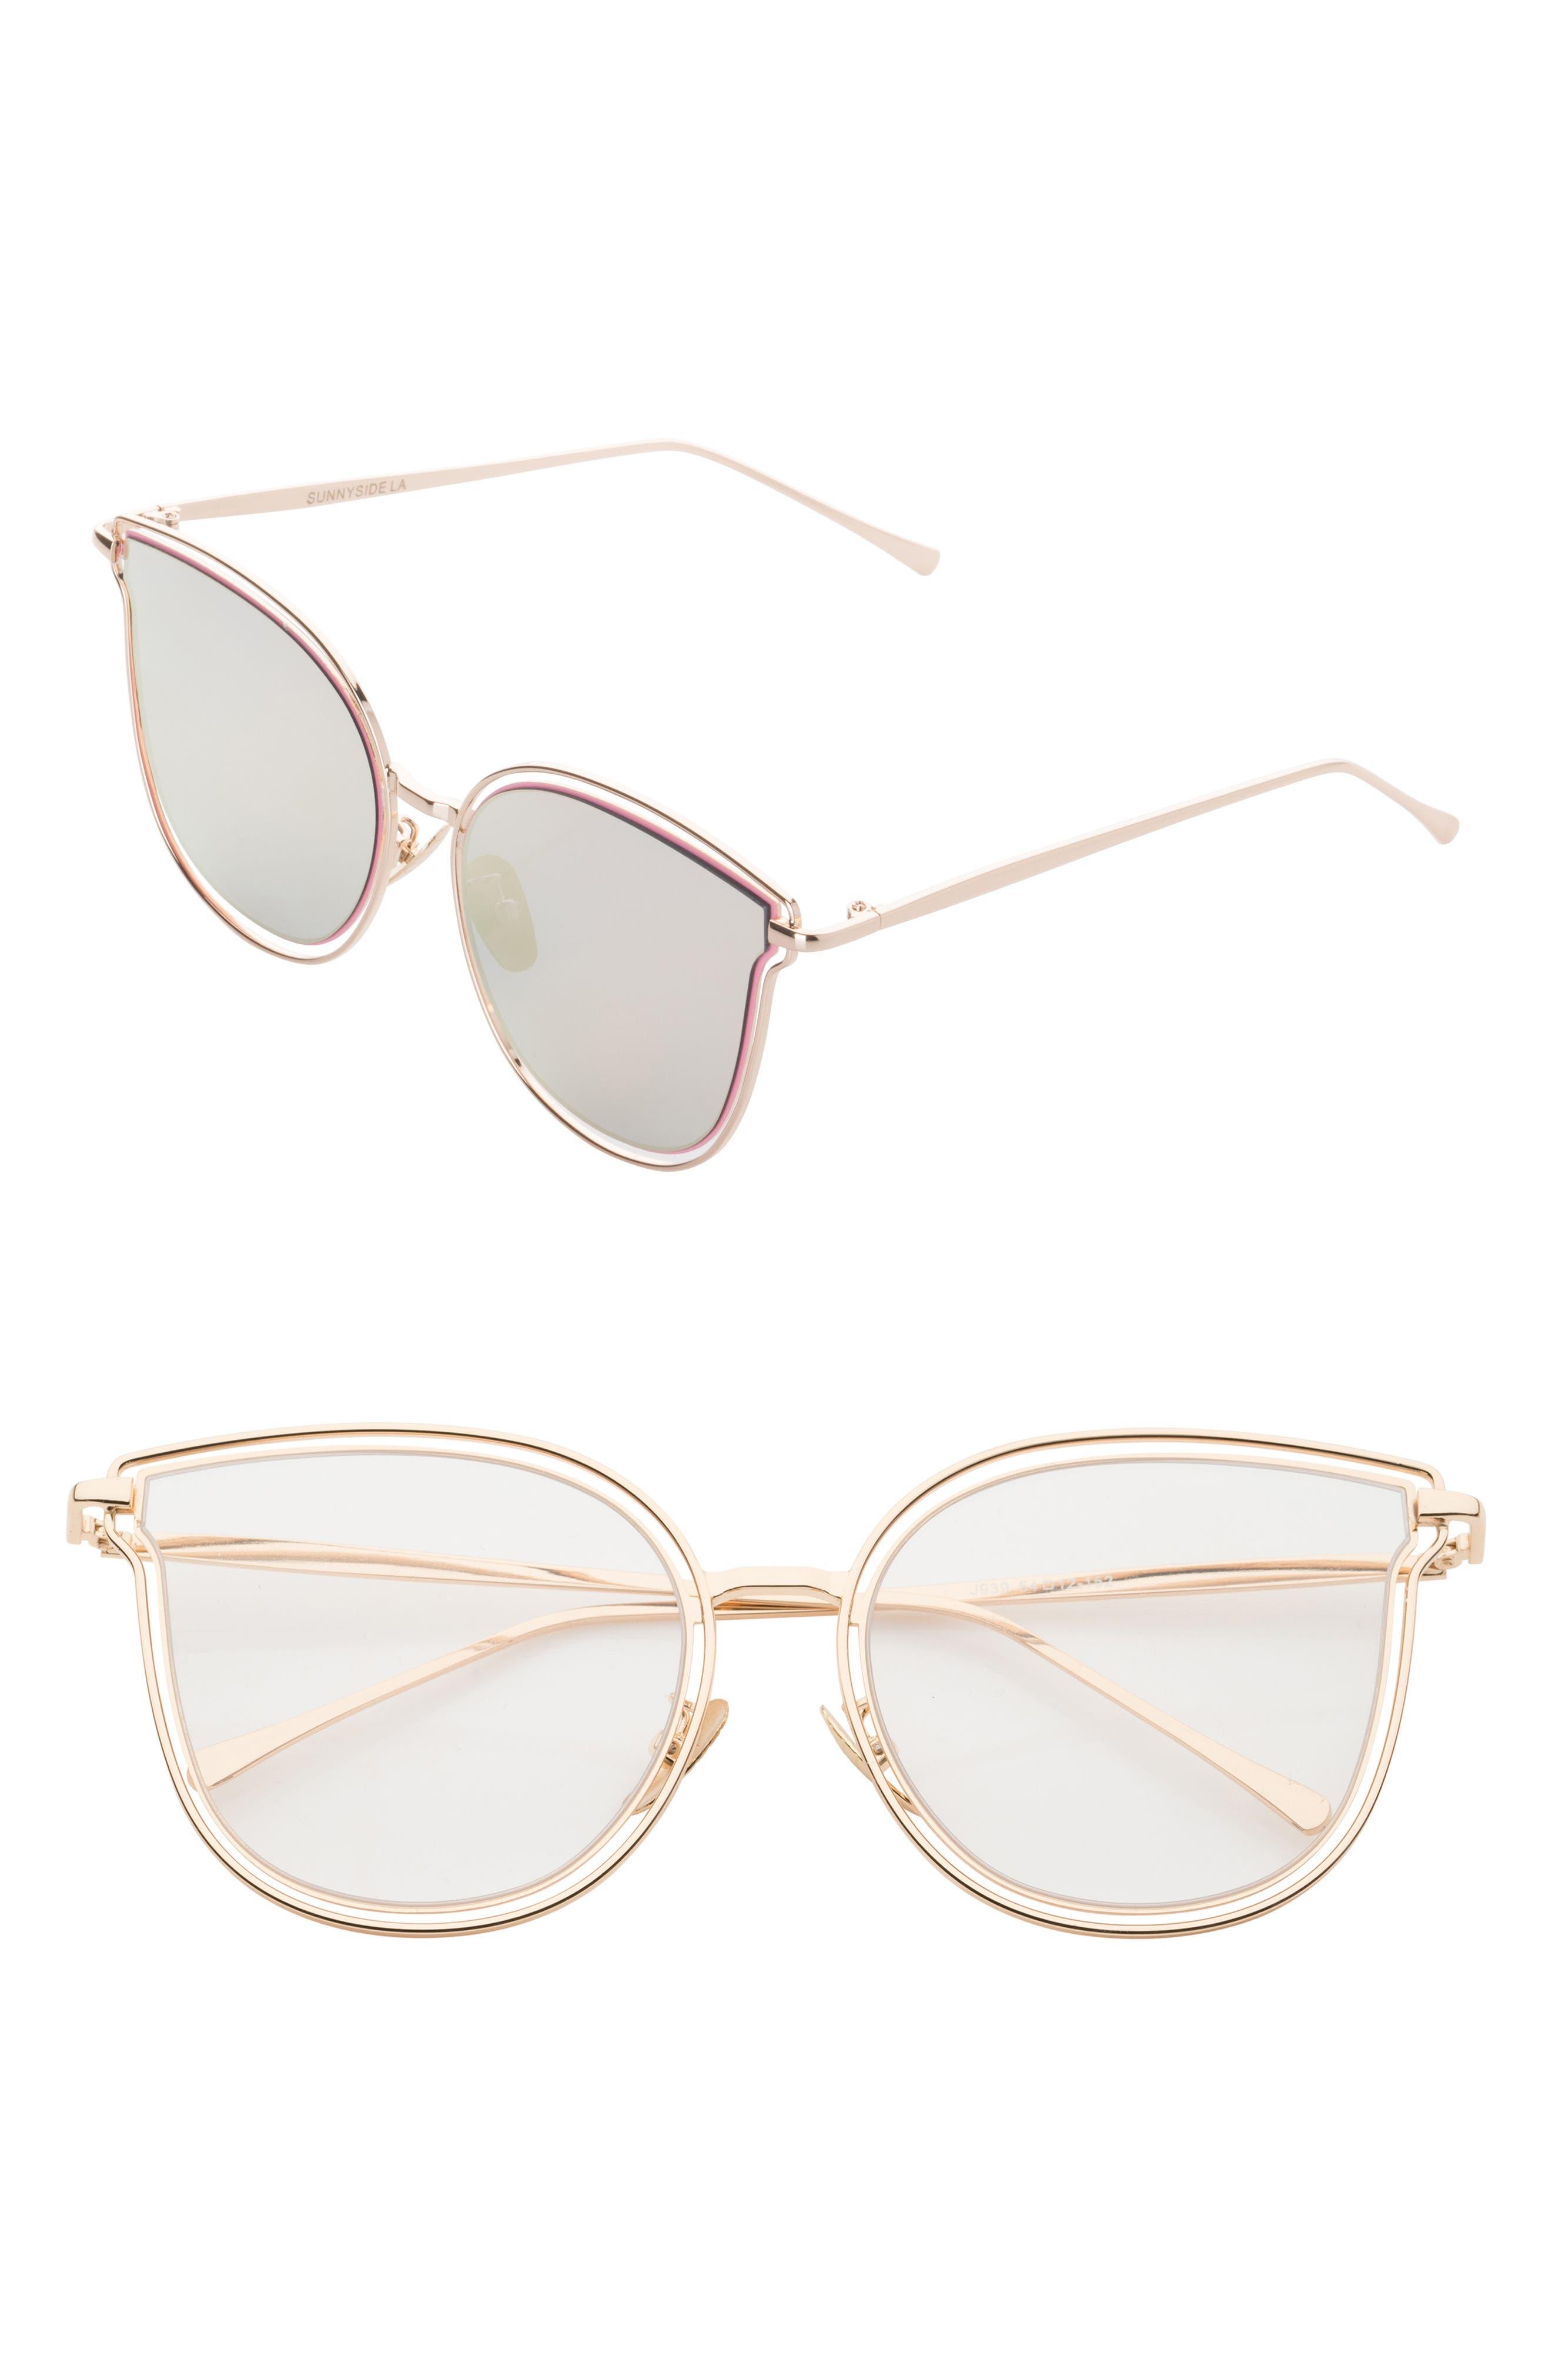 54mm Cat Eye Clear Glasses,                             Main thumbnail 1, color,                             710